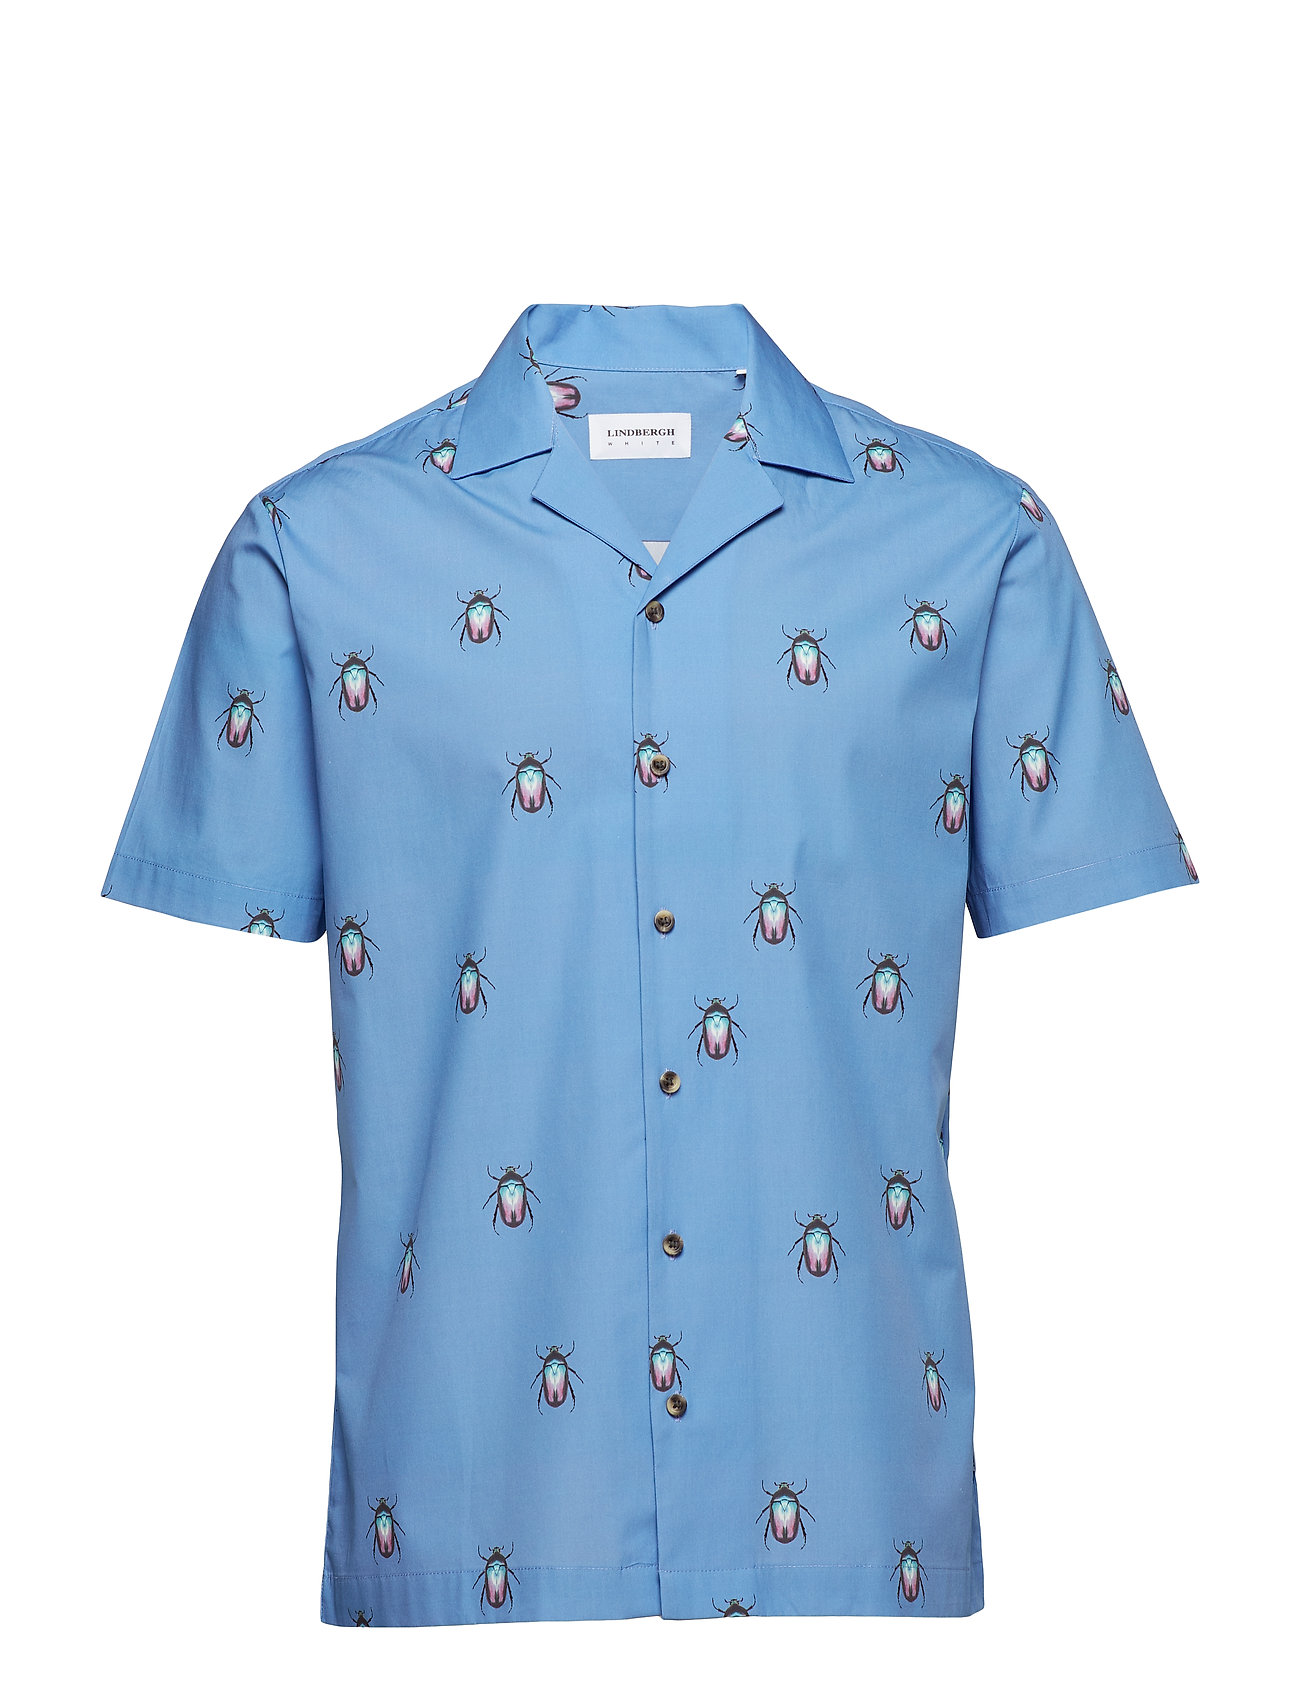 Lindbergh Printed resort shirt S/S - BLUE